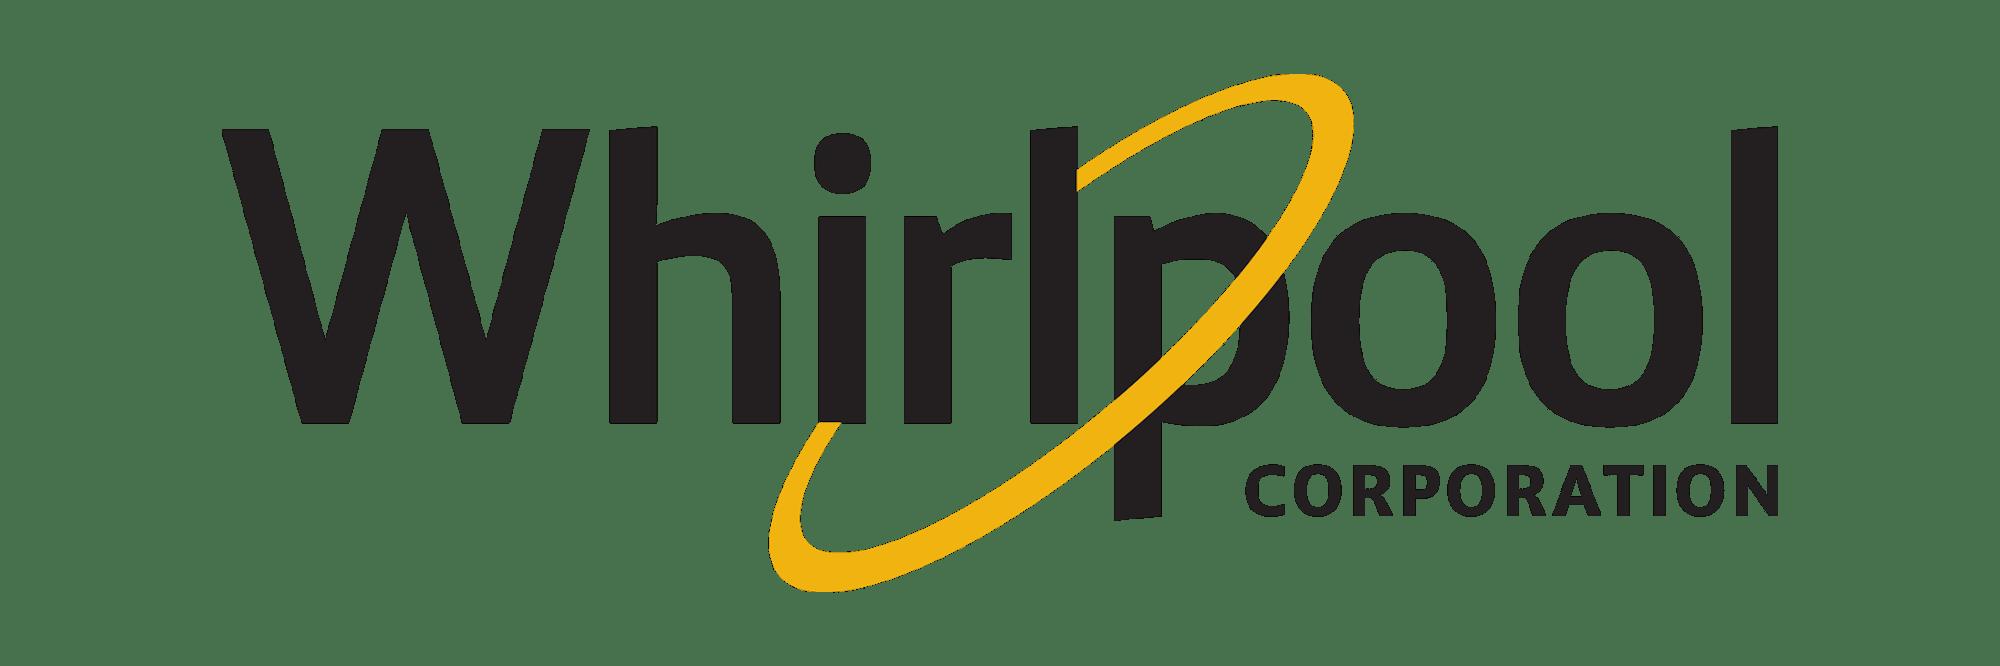 Whirlpool_Corporation_Logo